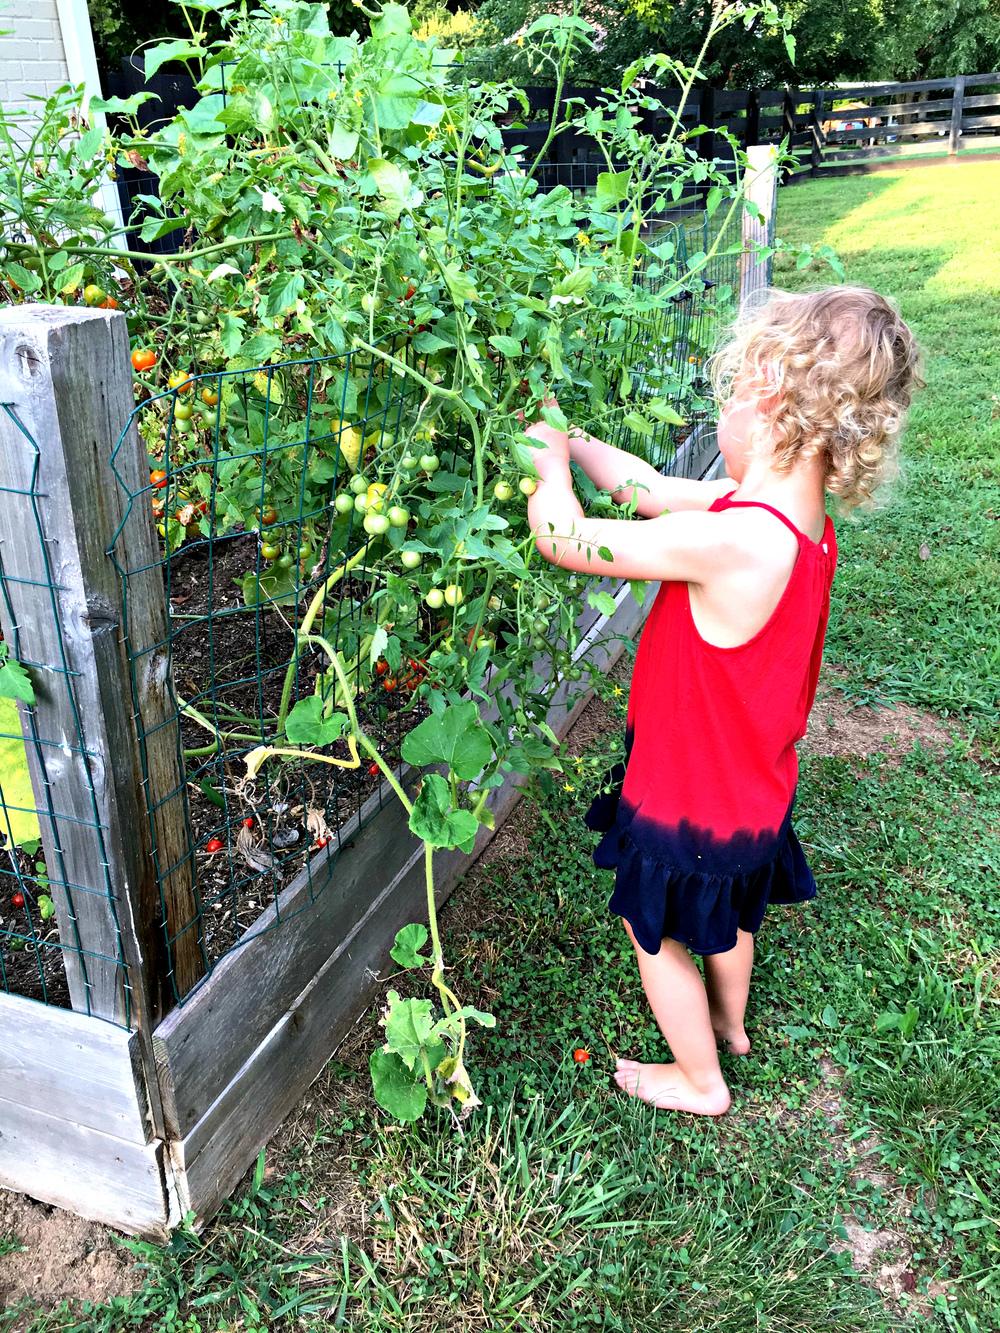 Hattie picking tomatoes July 2016